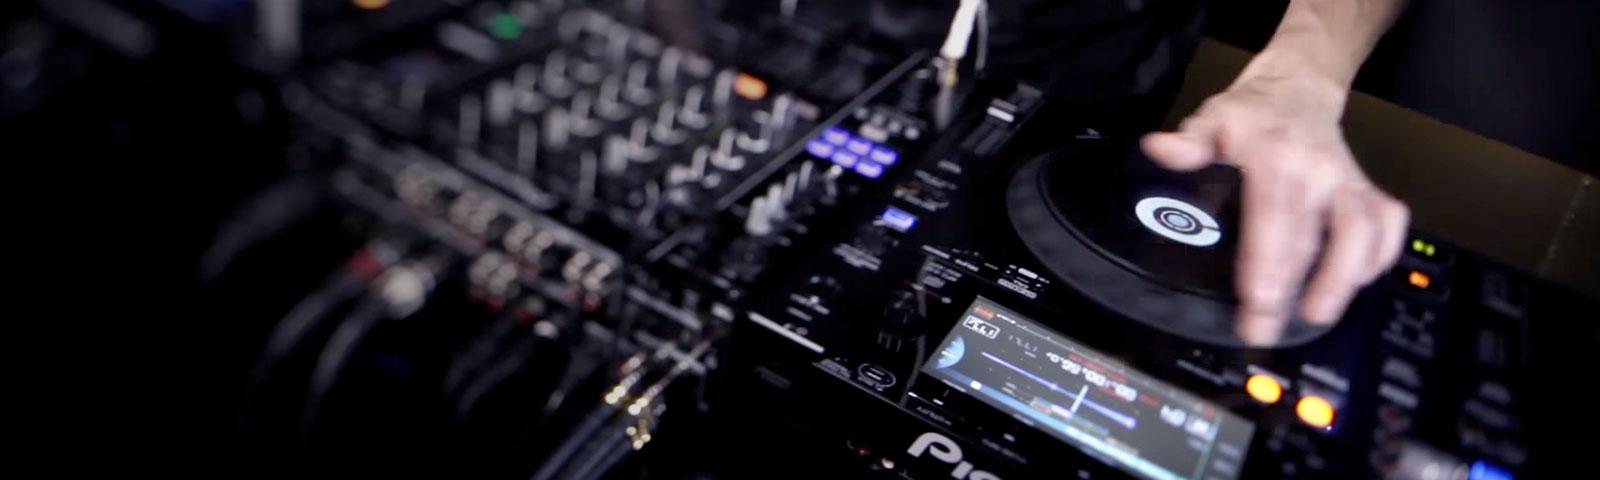 cdj-900nxs-header-img